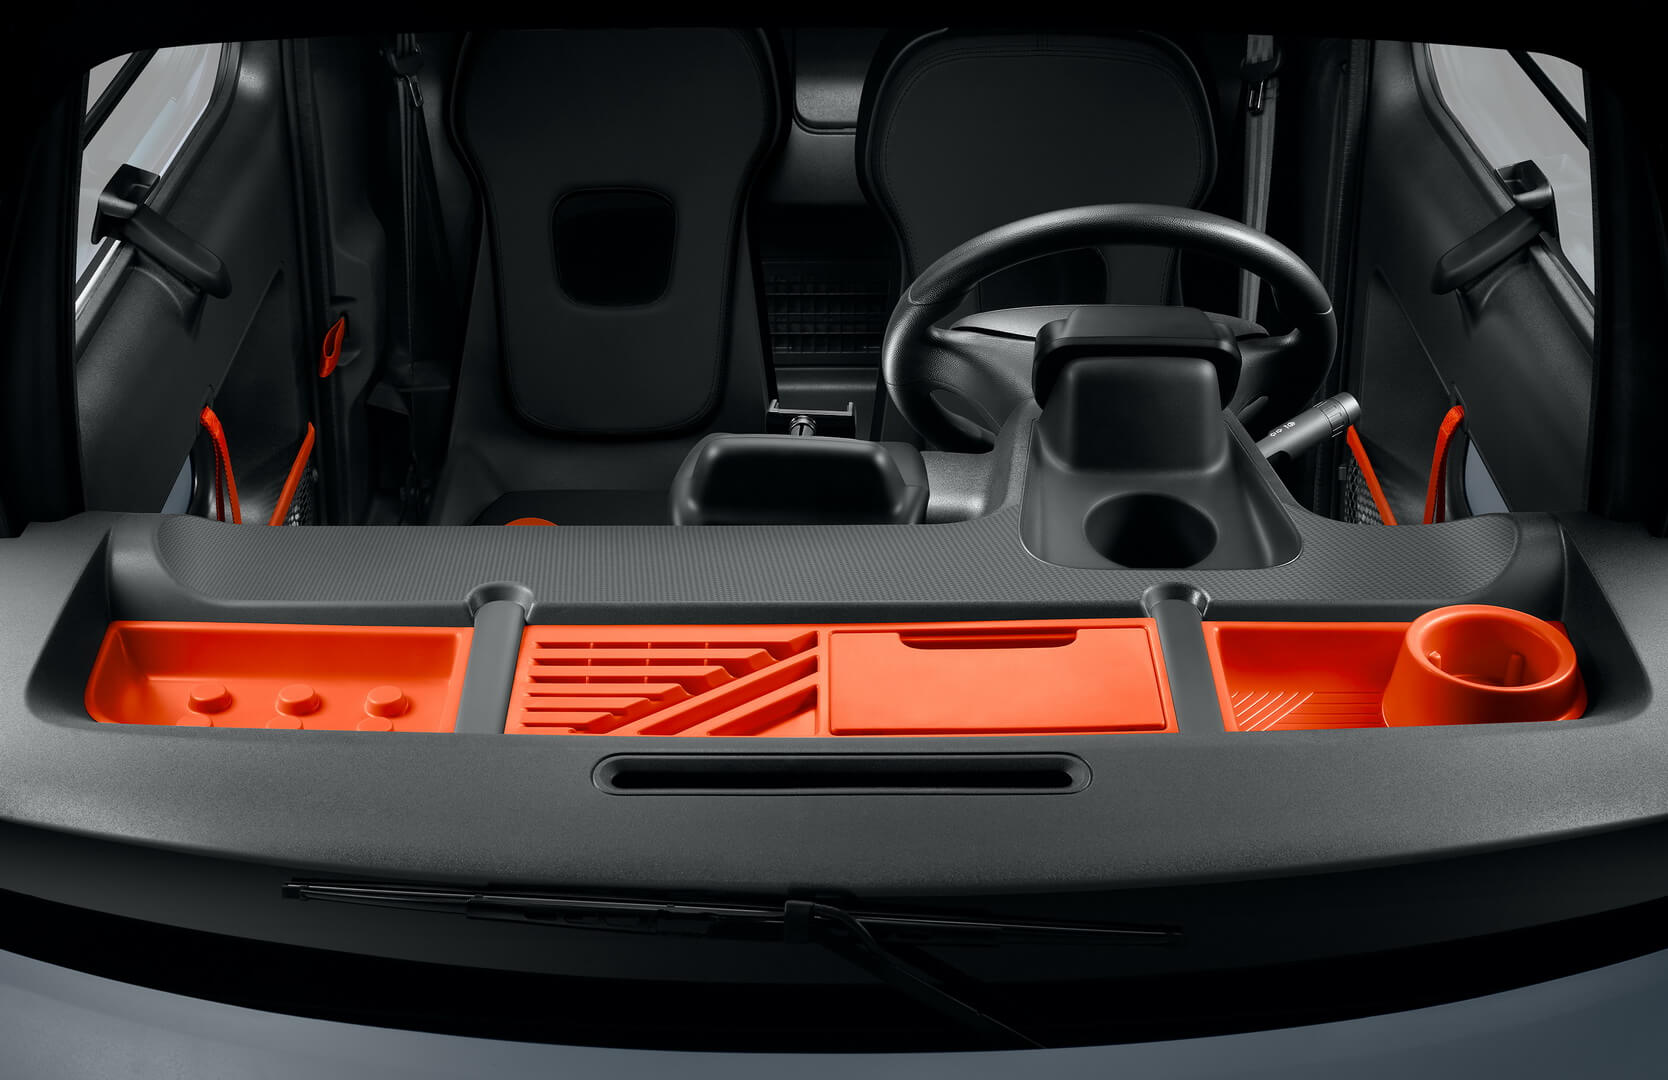 Салон миниатюрного электромобиля Citroën Ami